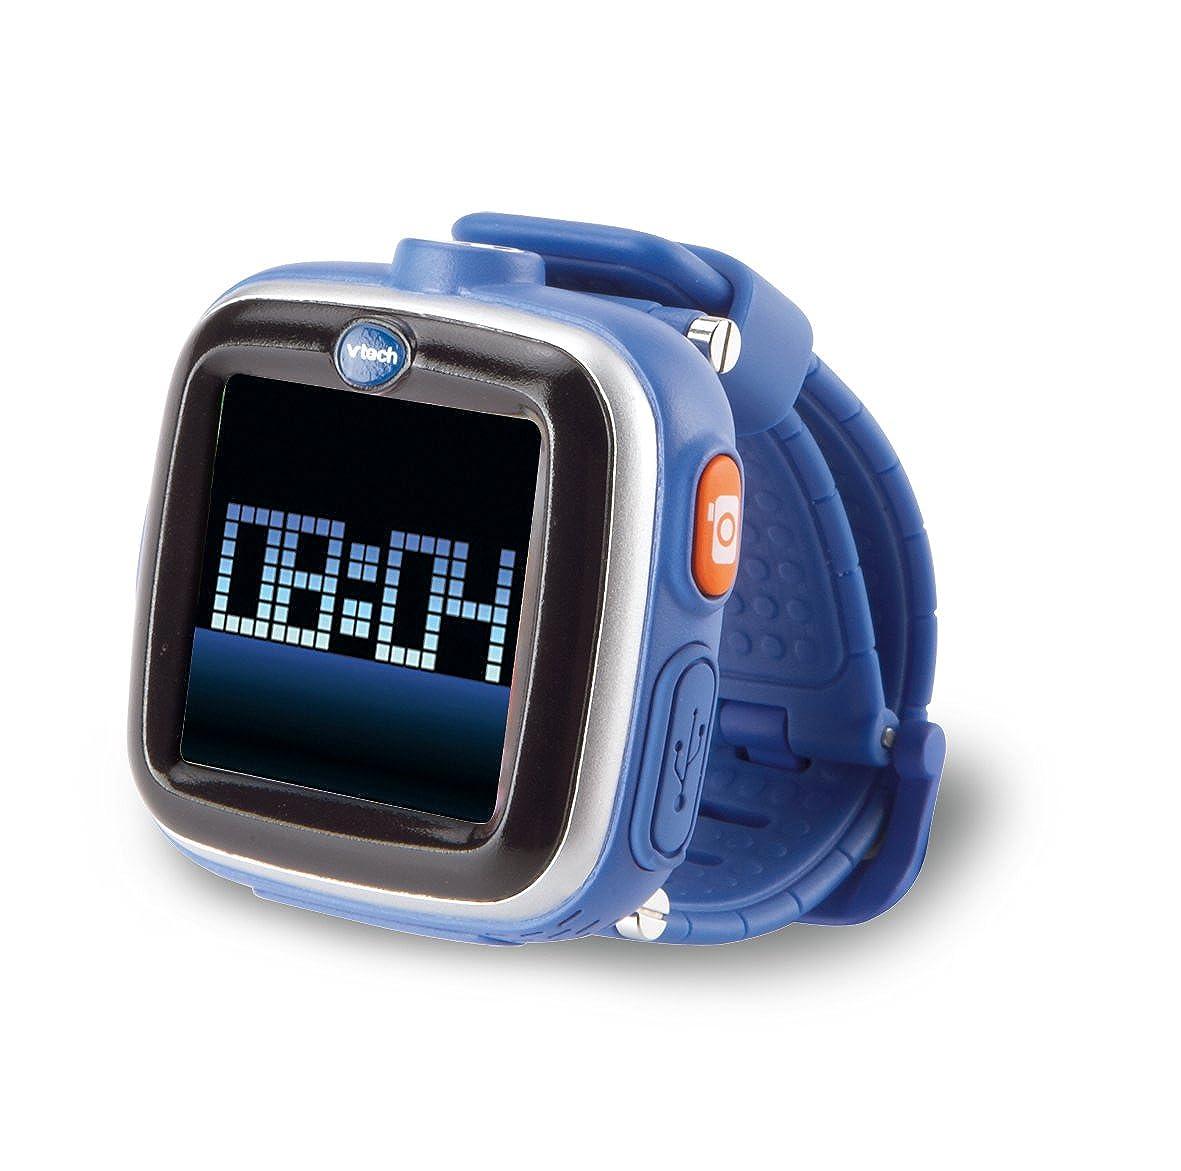 Amazon.com: Vtech Kidizoom Smart Watch - Blue.: Watches